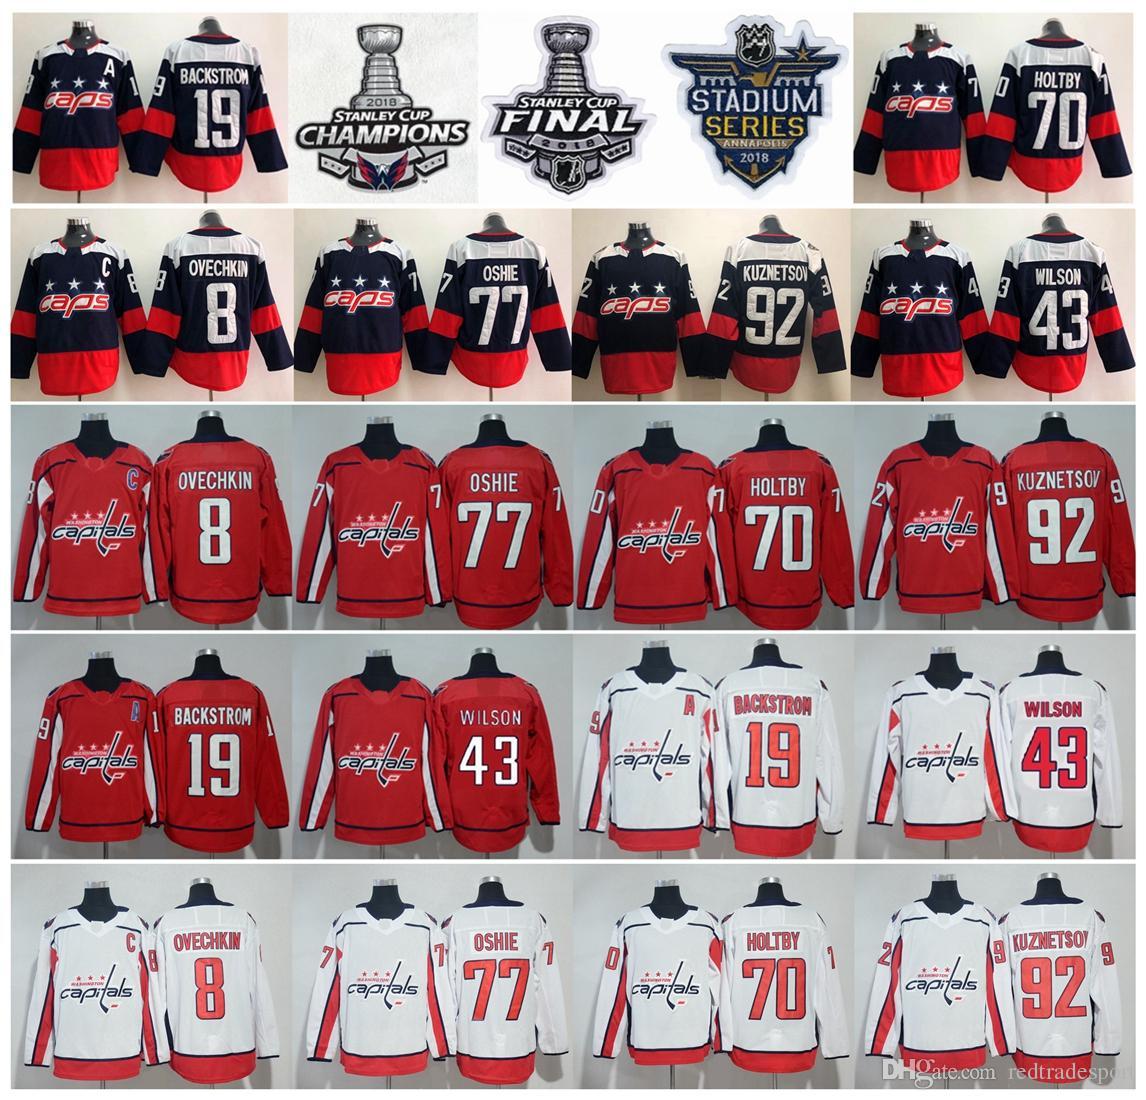 f38447f45 2018 Stanley Cup Final Washington Capitals Alex Ovechkin TJ Oshie Nicklas  Backstrom Braden Holtby Evgeny Kuznetsov Tom Wilson Hockey Jersey Evgeny  Kuznetsov ...